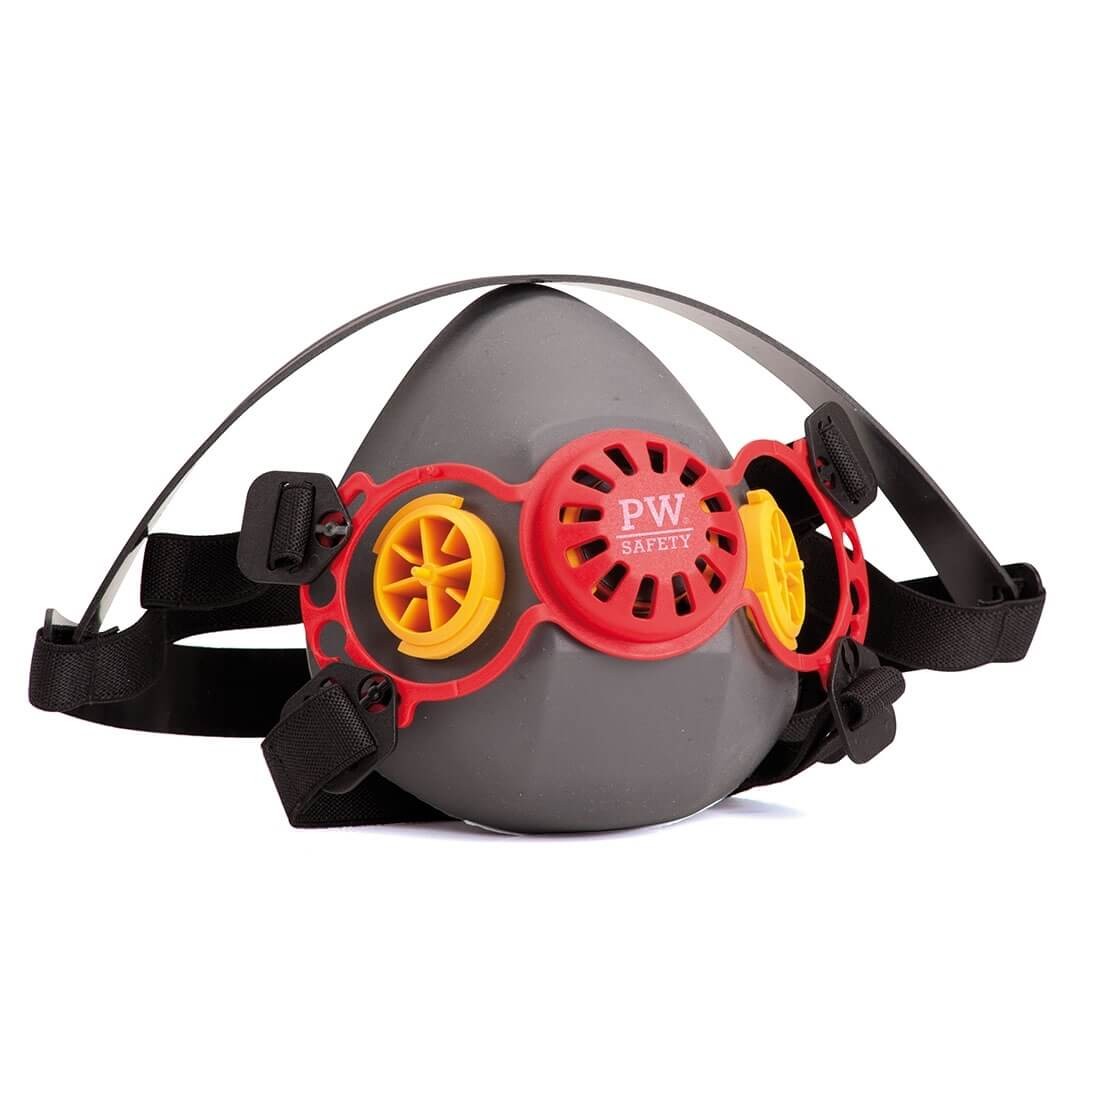 Semi Masca Geneva - Echipamente de protectie personala